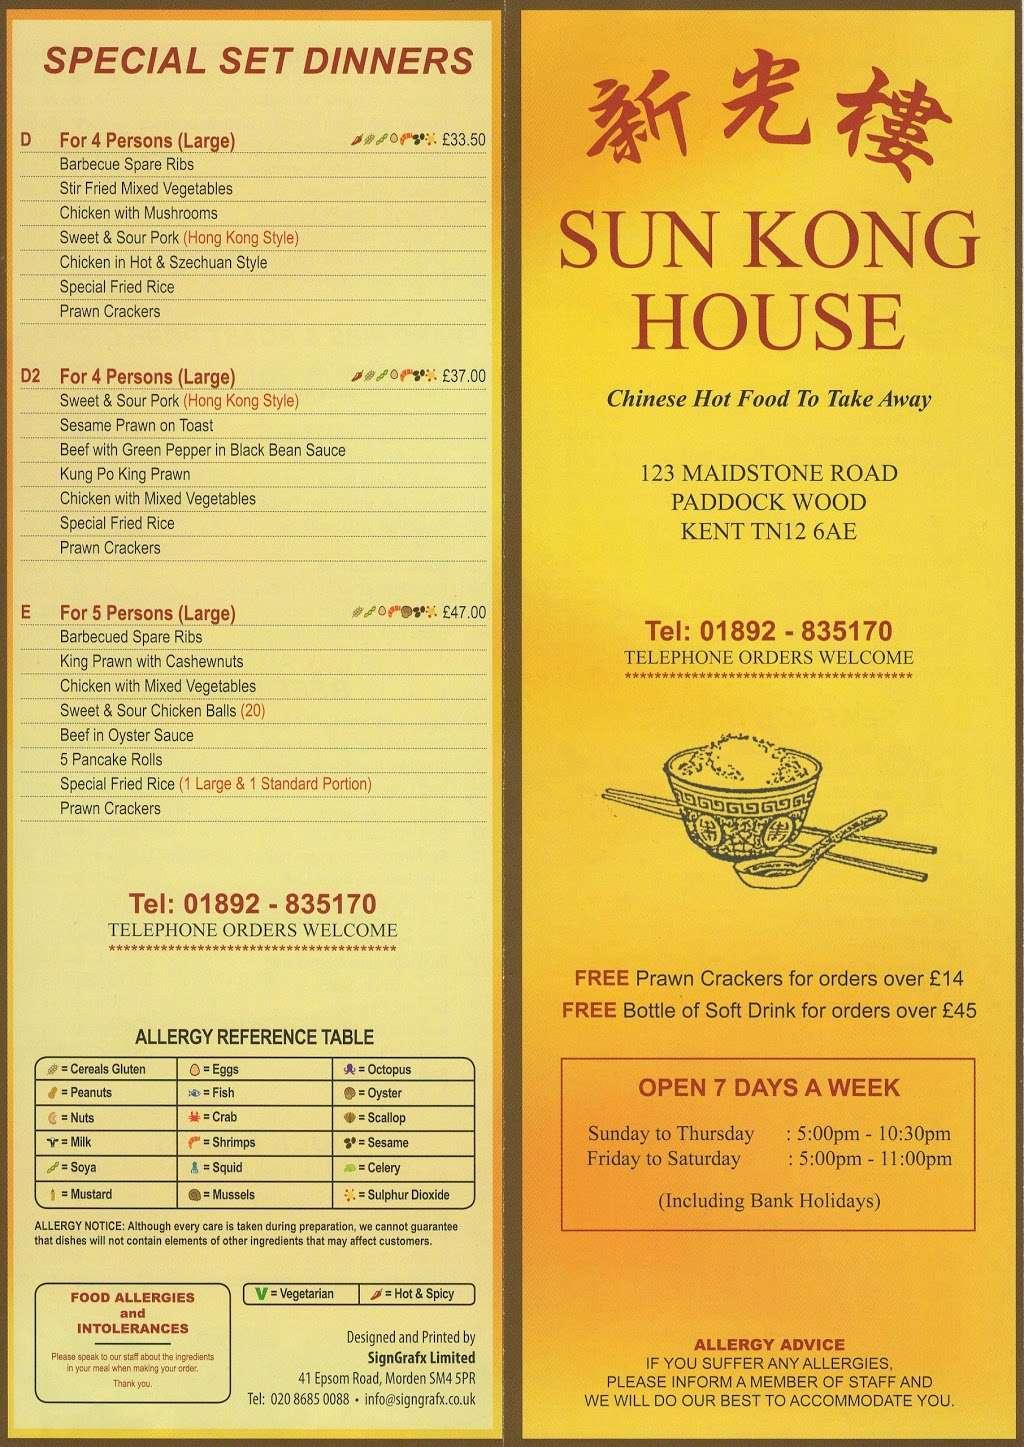 Sun Kong House - meal takeaway  | Photo 5 of 5 | Address: 123 Maidstone Rd, Paddock Wood, Tonbridge TN12 6AE, UK | Phone: 01892 835170